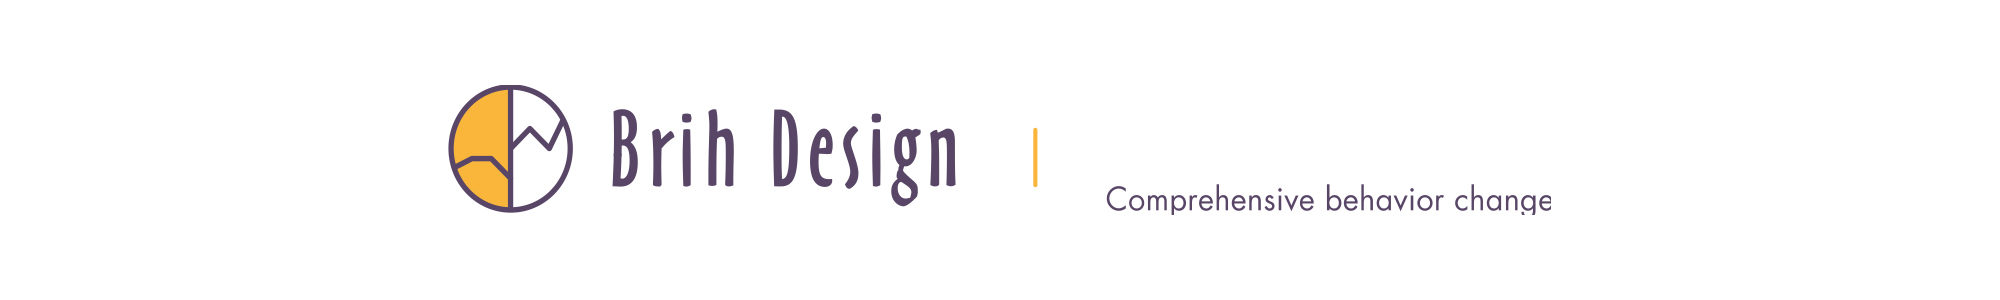 Brih Design